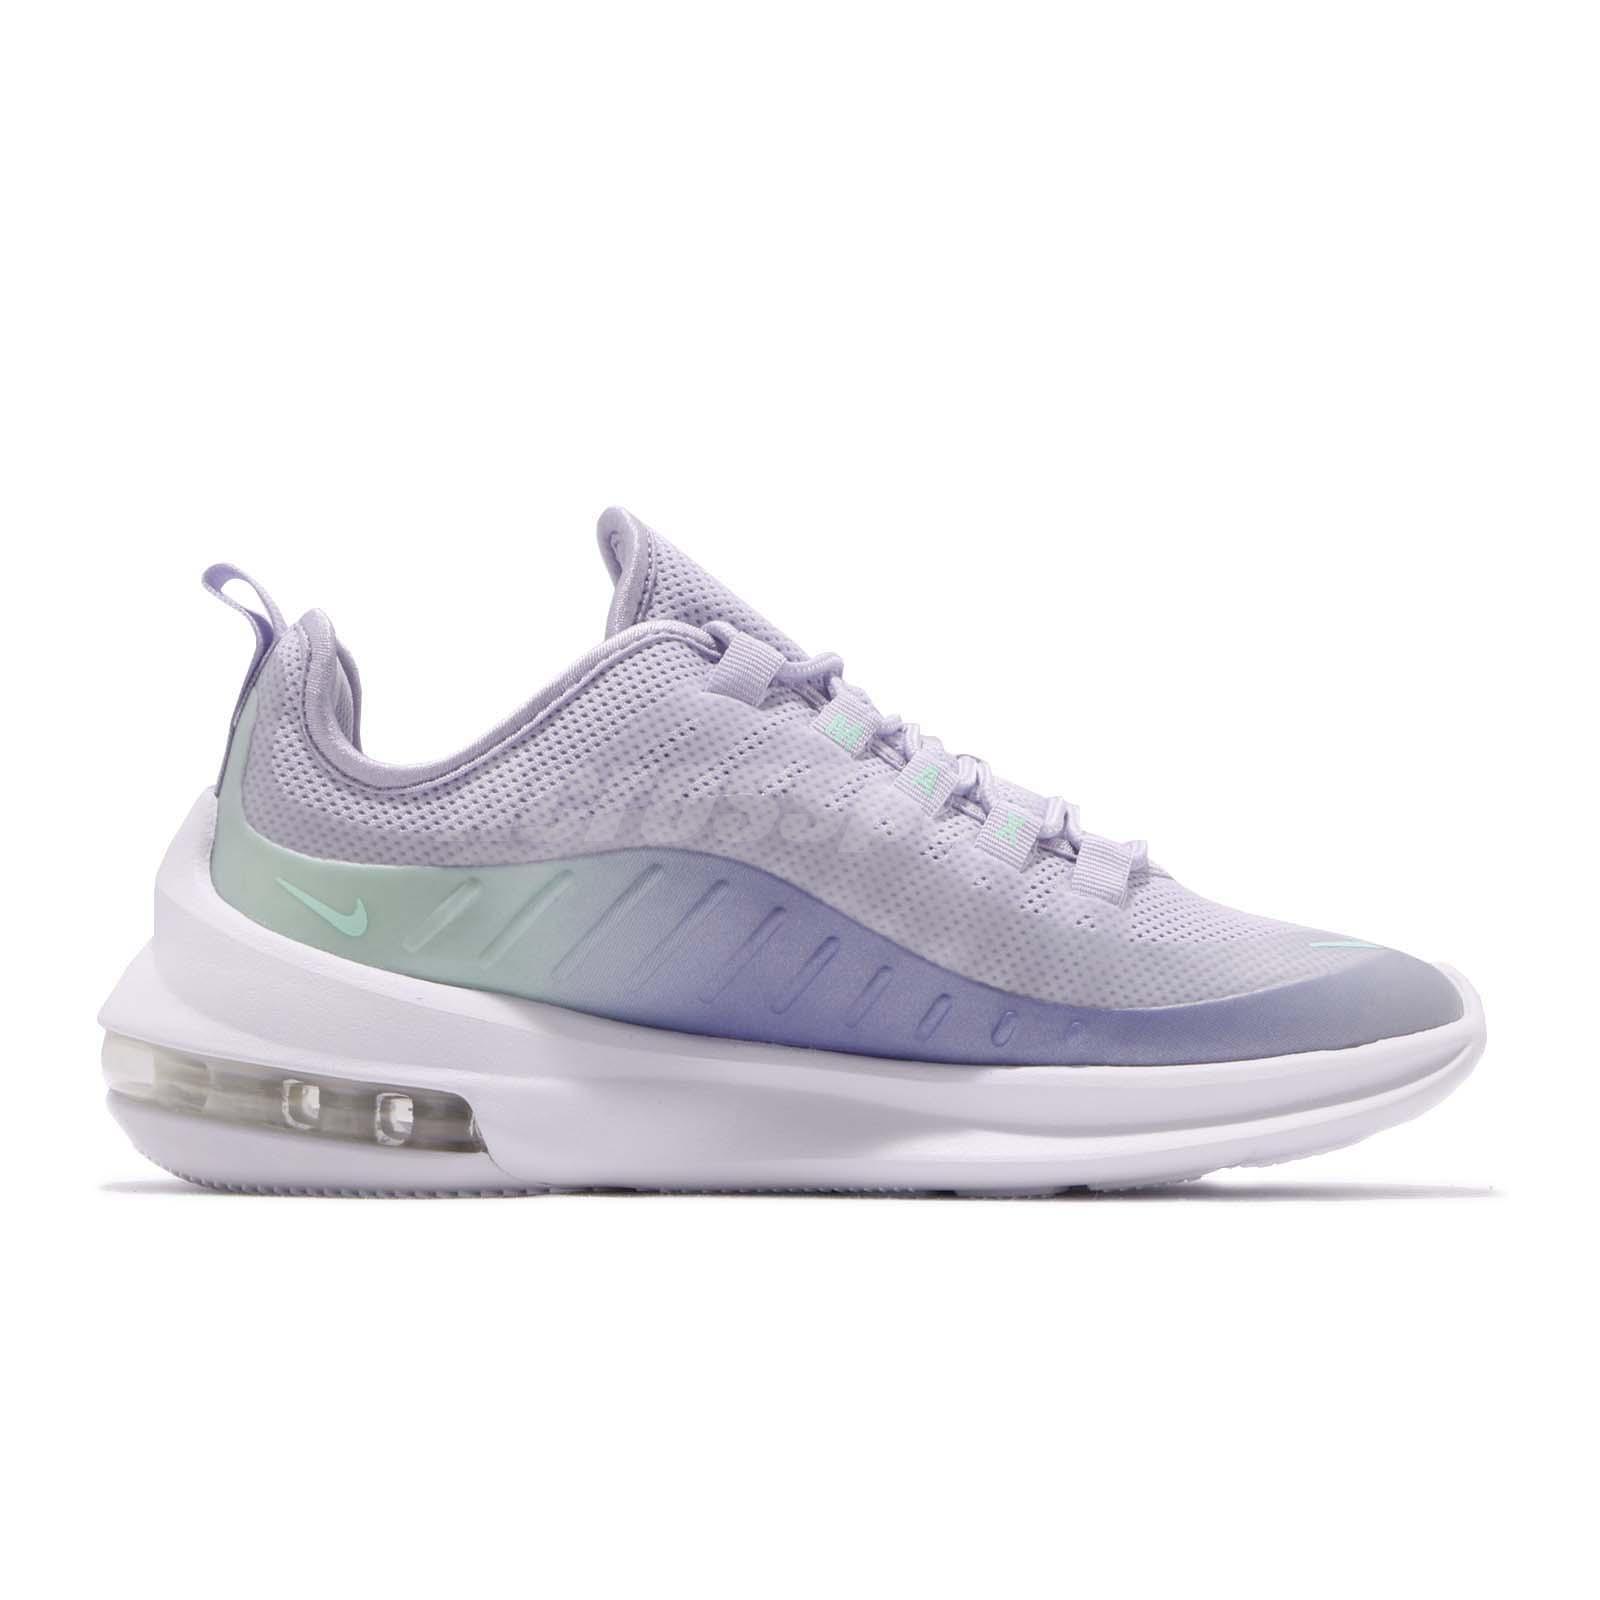 Details about Nike Wmns Air Max Axis PREM Oxygen Purple Teal Tint Women Shoes BQ0126 500